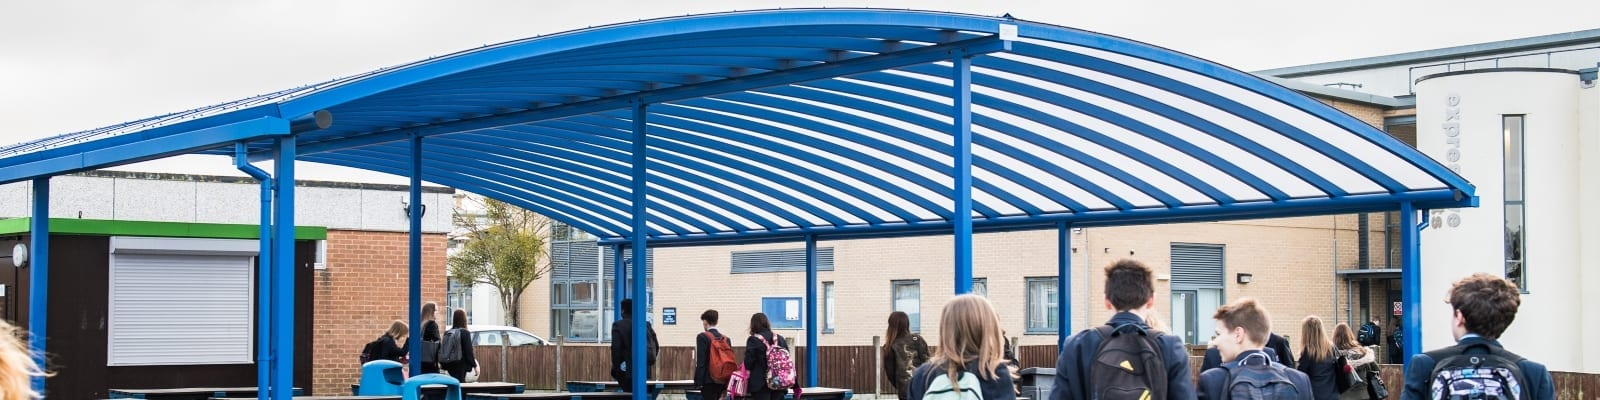 Tewkesbury School Dining Shelter